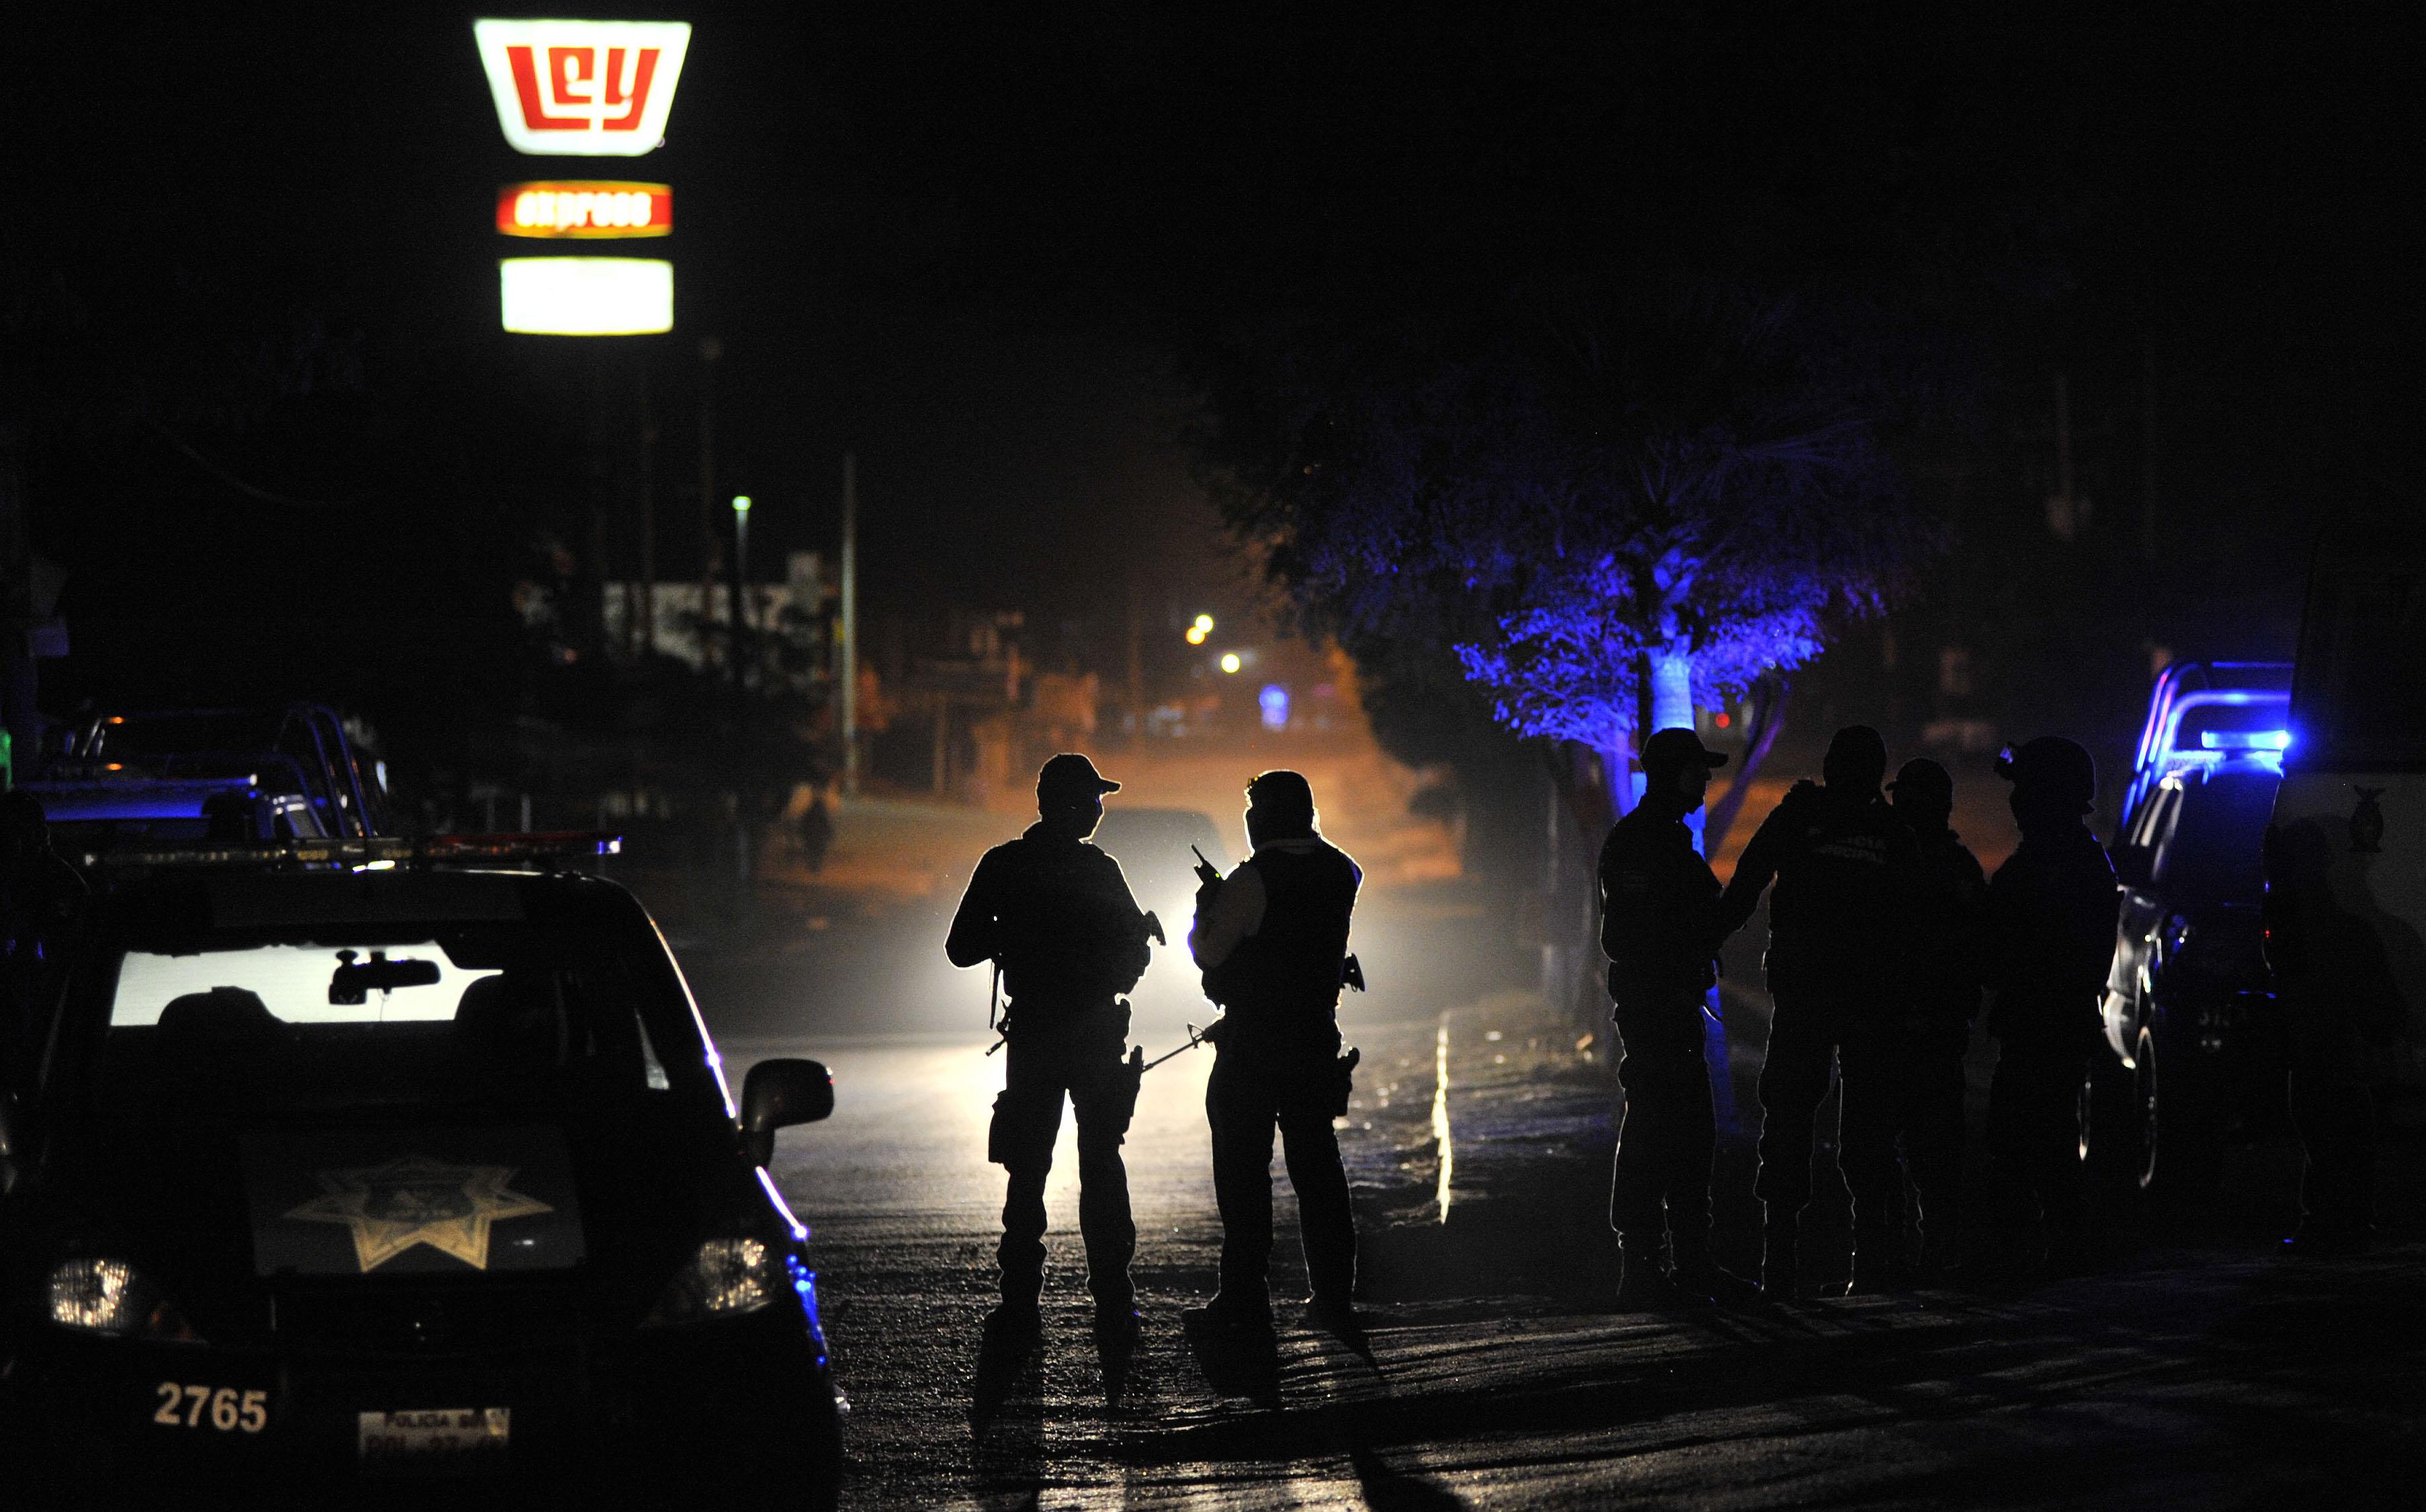 TOPSHOT-MEXICO-CRIME-SHOOTING-GANG